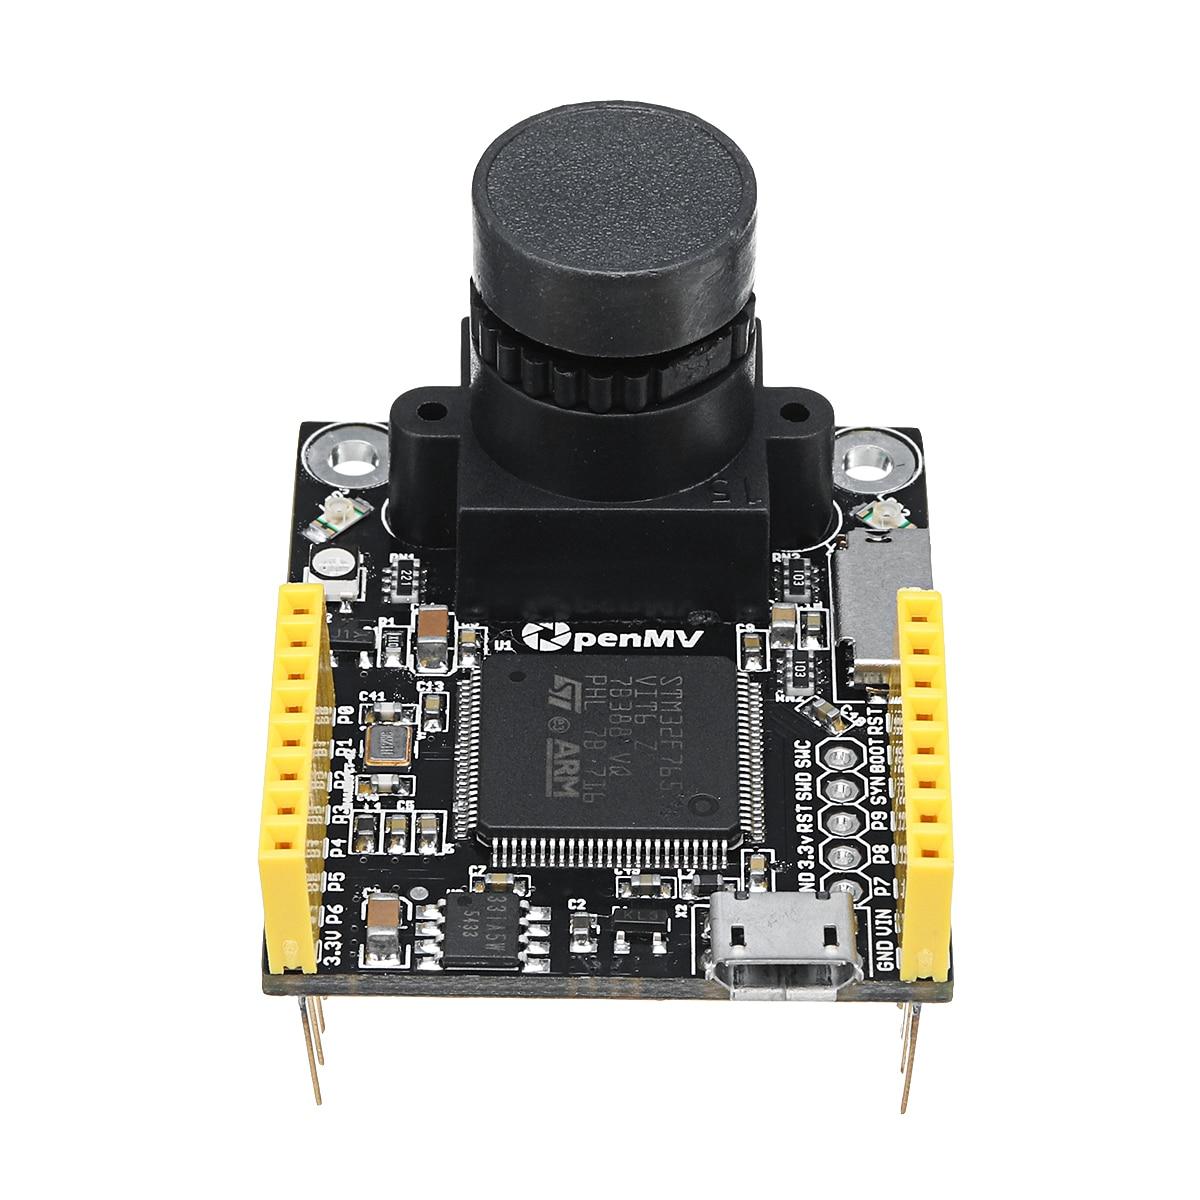 2018 OpenMV3 Cam M7 Smart Camera Image Processing Color Recognition Sensor Visual Inspection Line Camera Board2018 OpenMV3 Cam M7 Smart Camera Image Processing Color Recognition Sensor Visual Inspection Line Camera Board